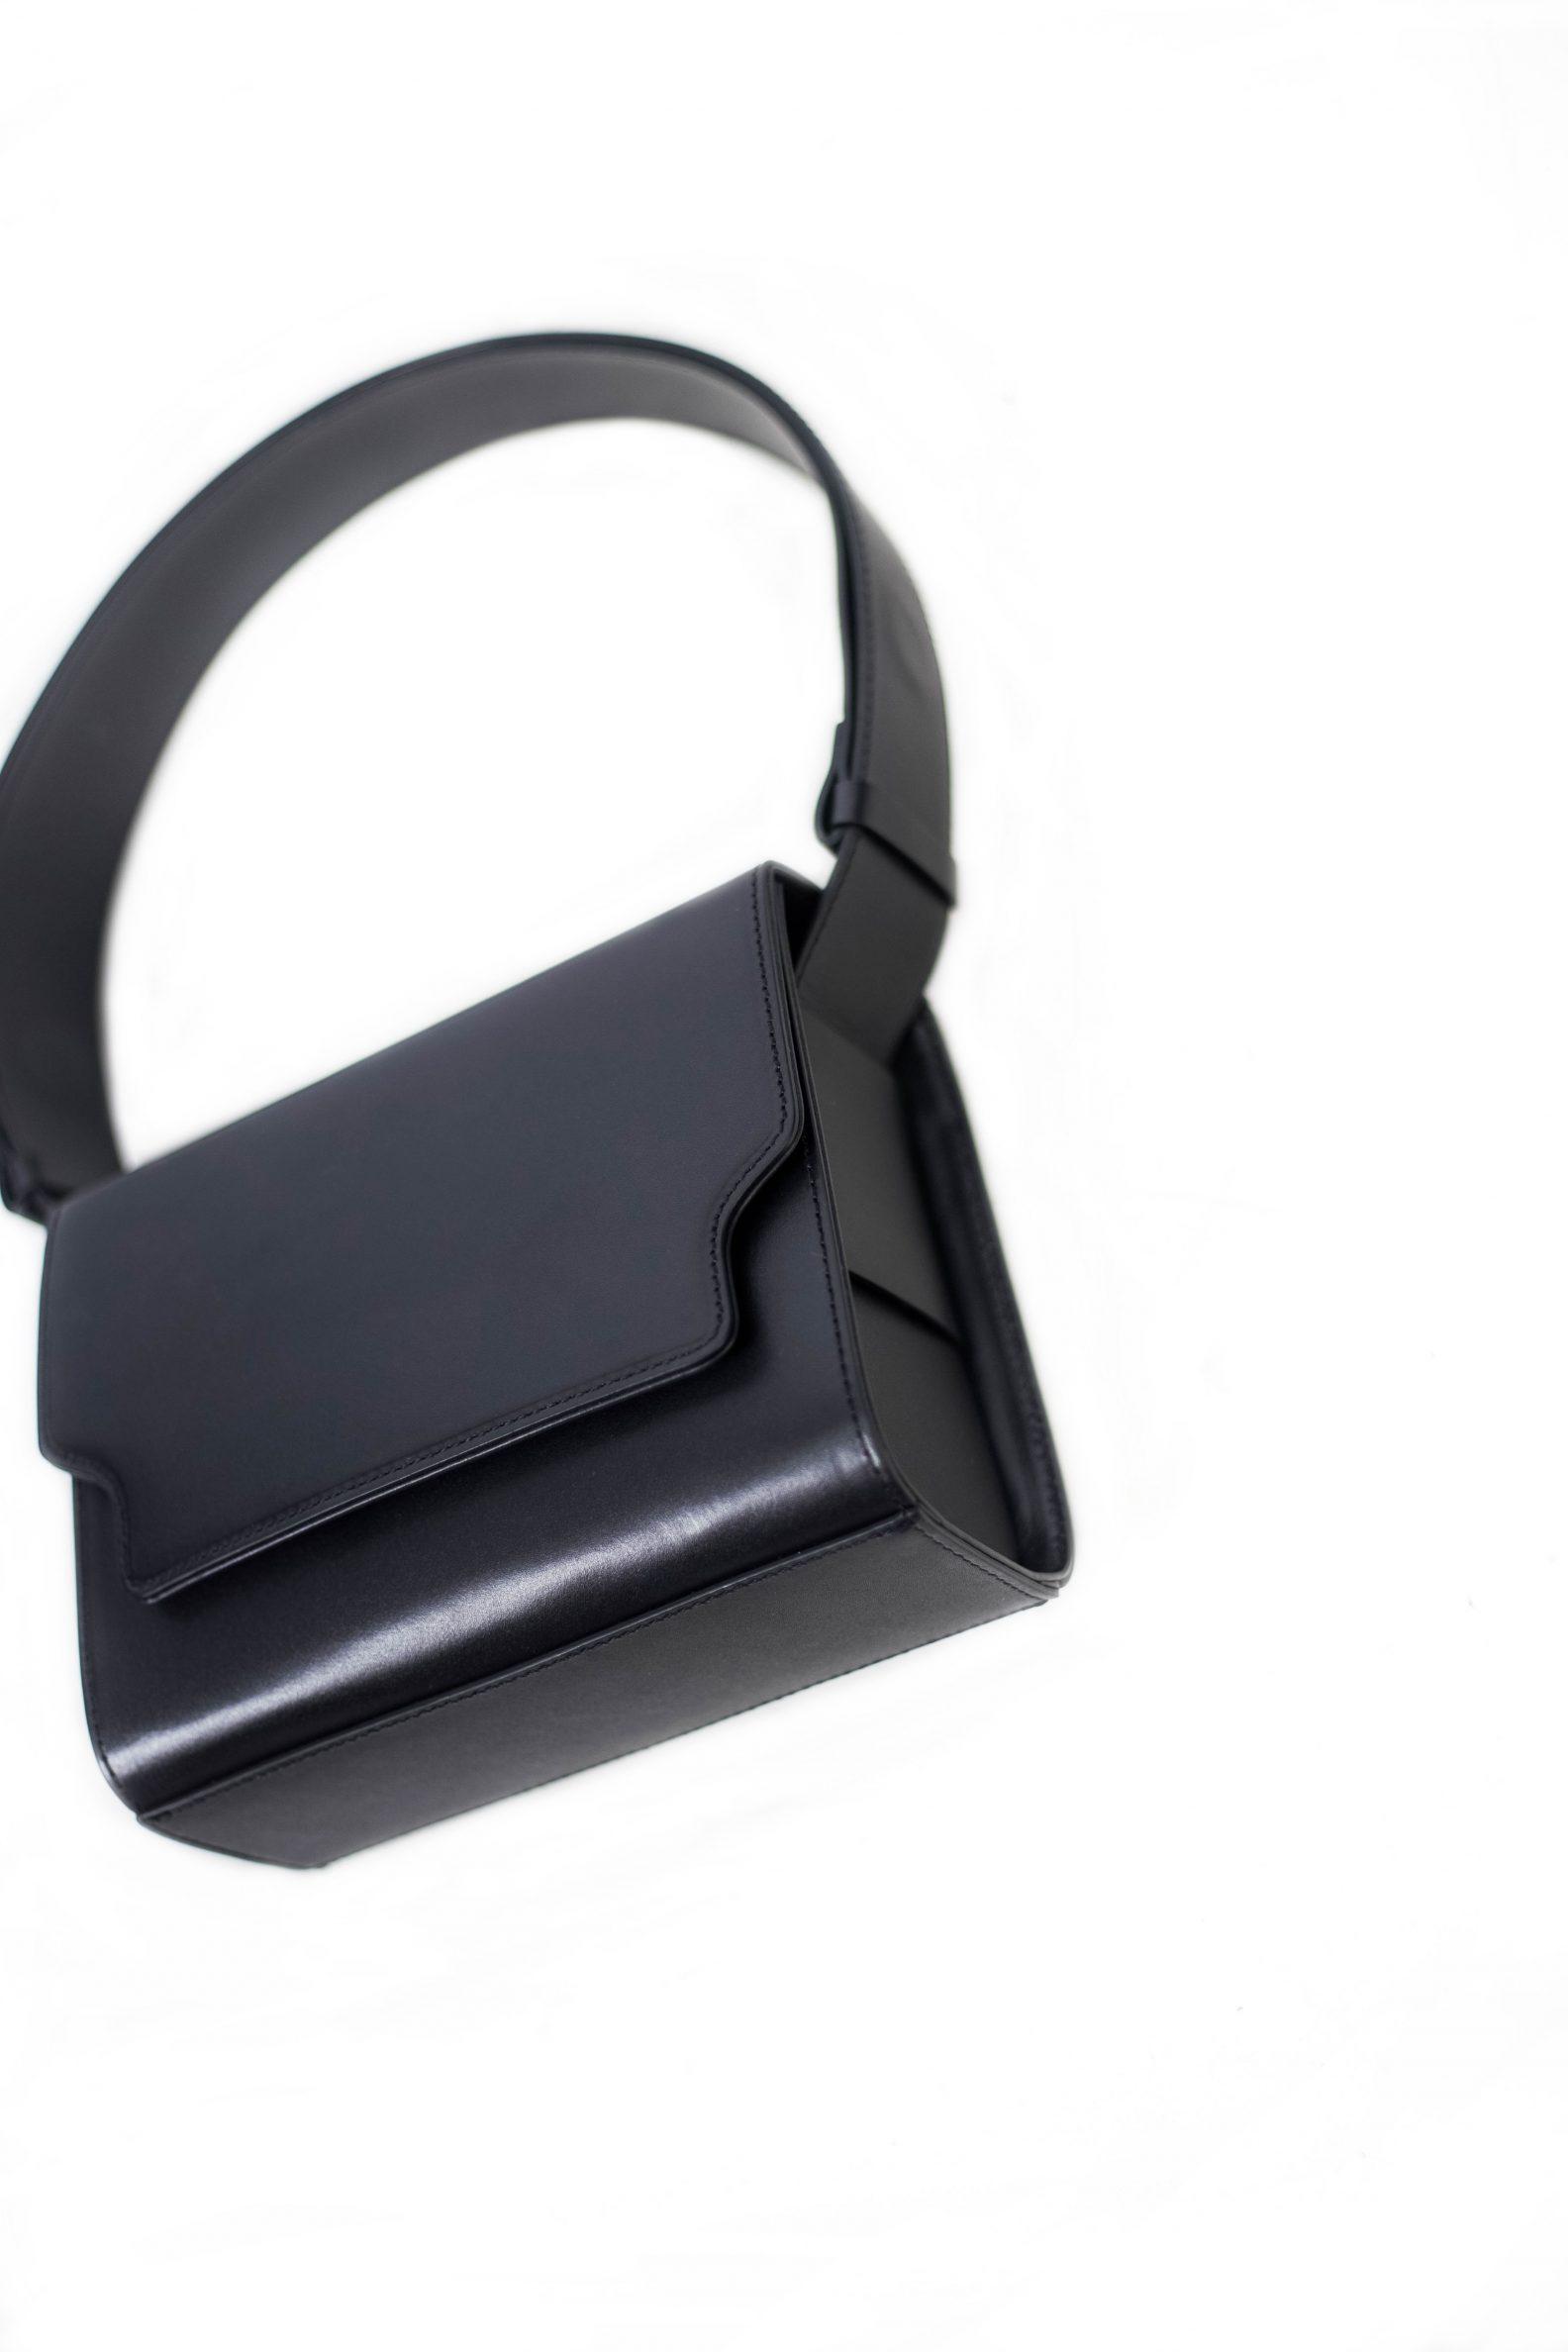 3-sac-cuir-rabat-noir-affaires-etrangeres-paris-mode-coreenne-besides-kimchi-jpg